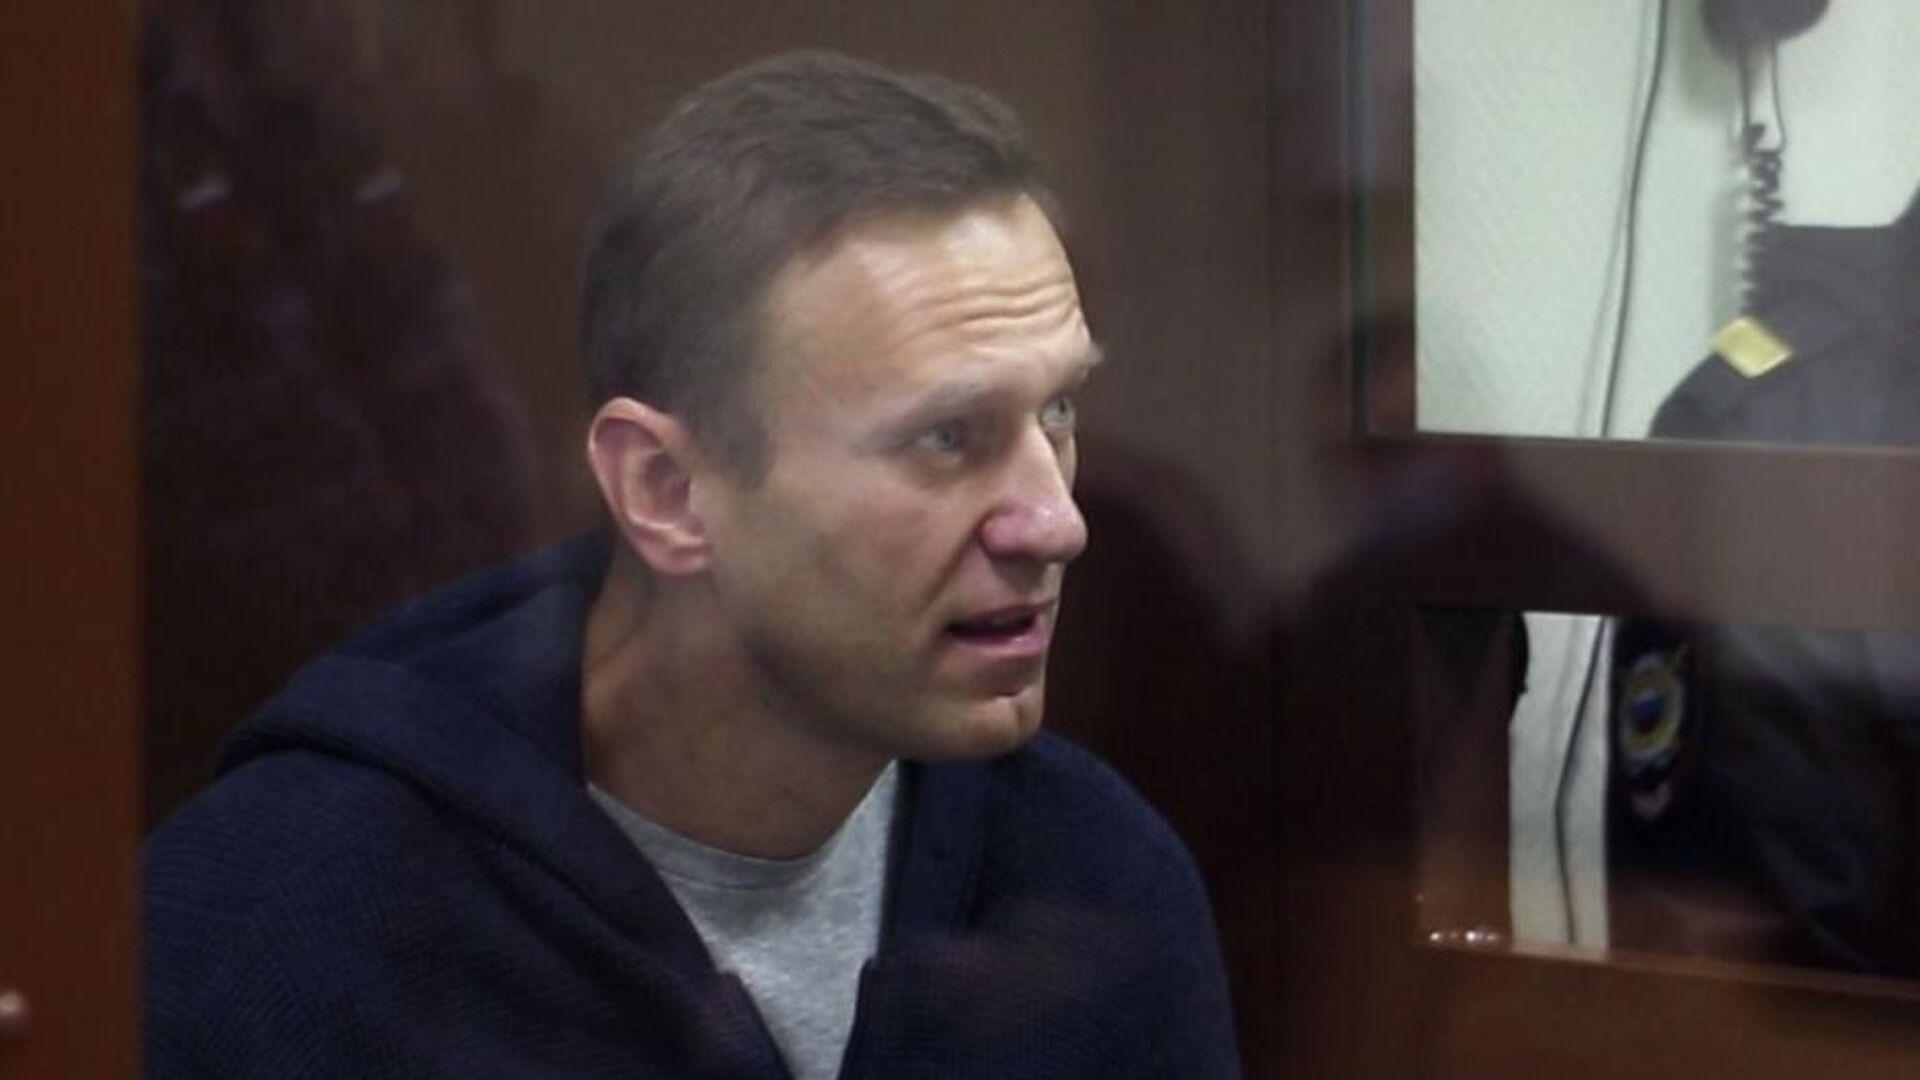 Alexéi Navalni, bloguero opositor ruso - Sputnik Mundo, 1920, 18.02.2021